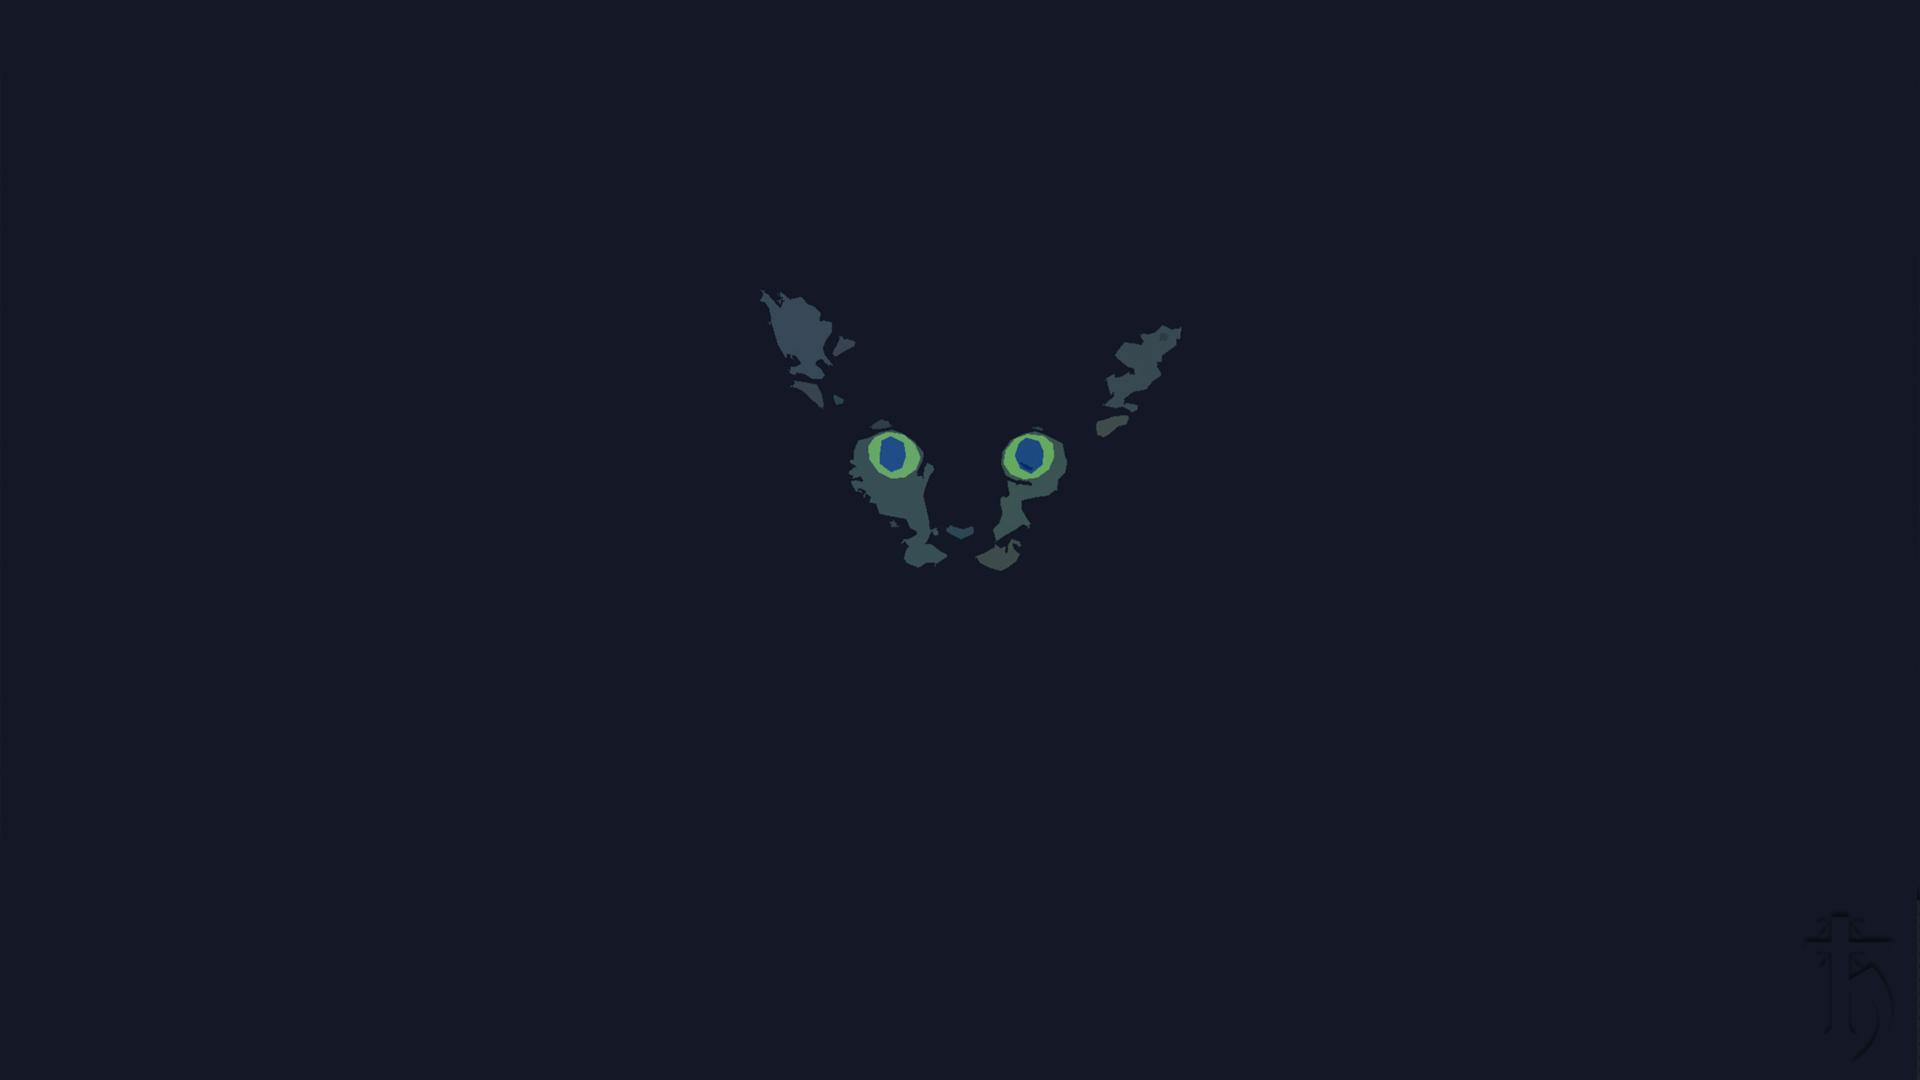 Cat In The Dark Illustration Desktop Wallpaper 1920x1080